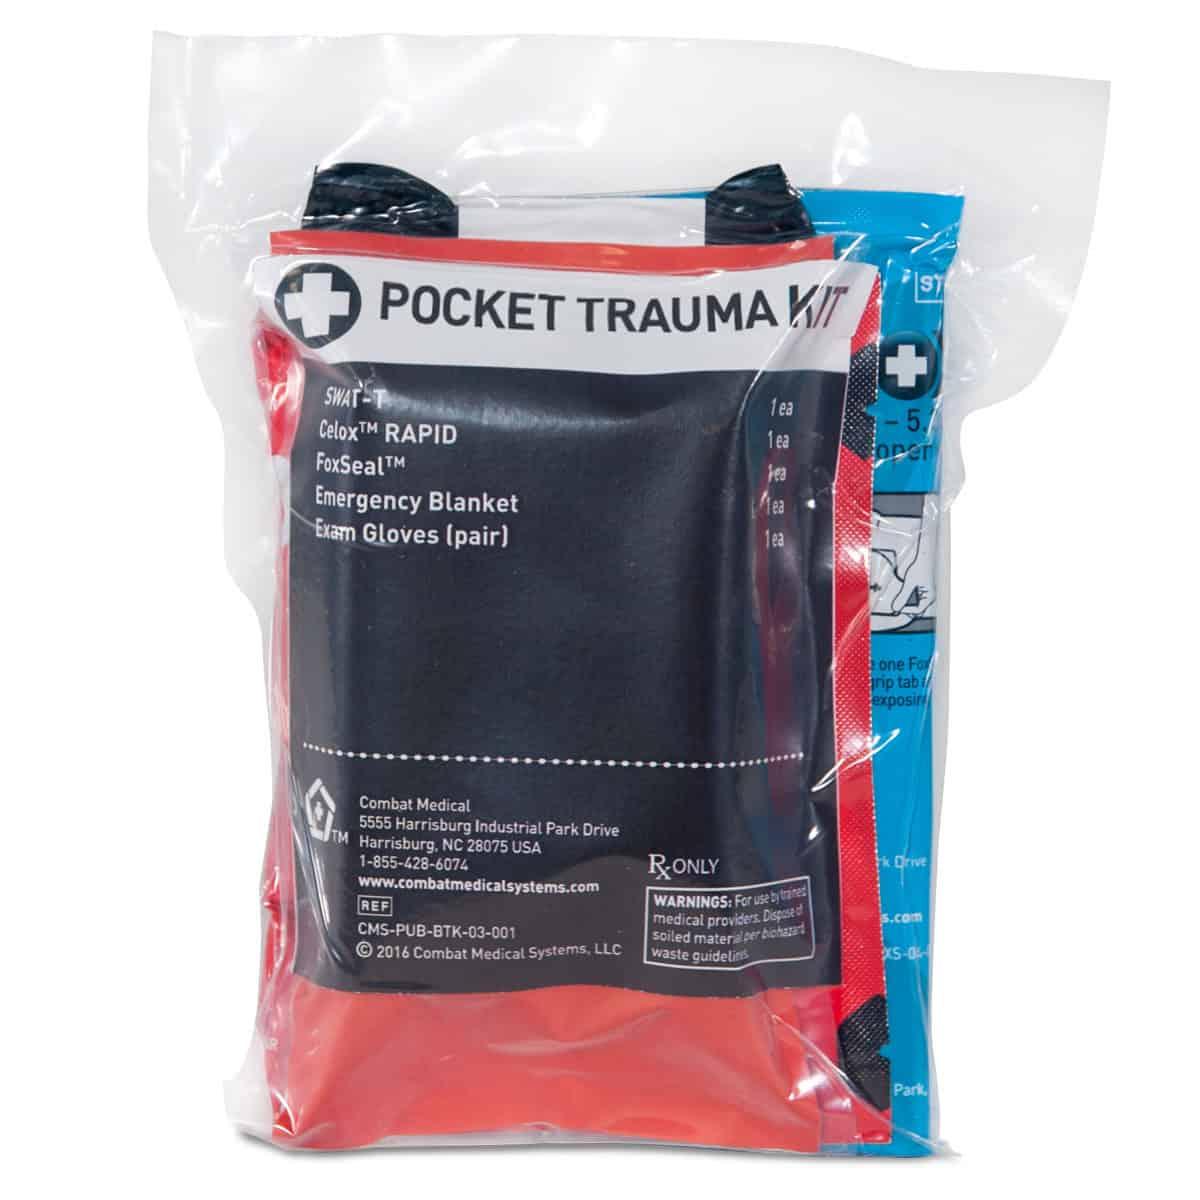 mojo pocket trauma kit packaged